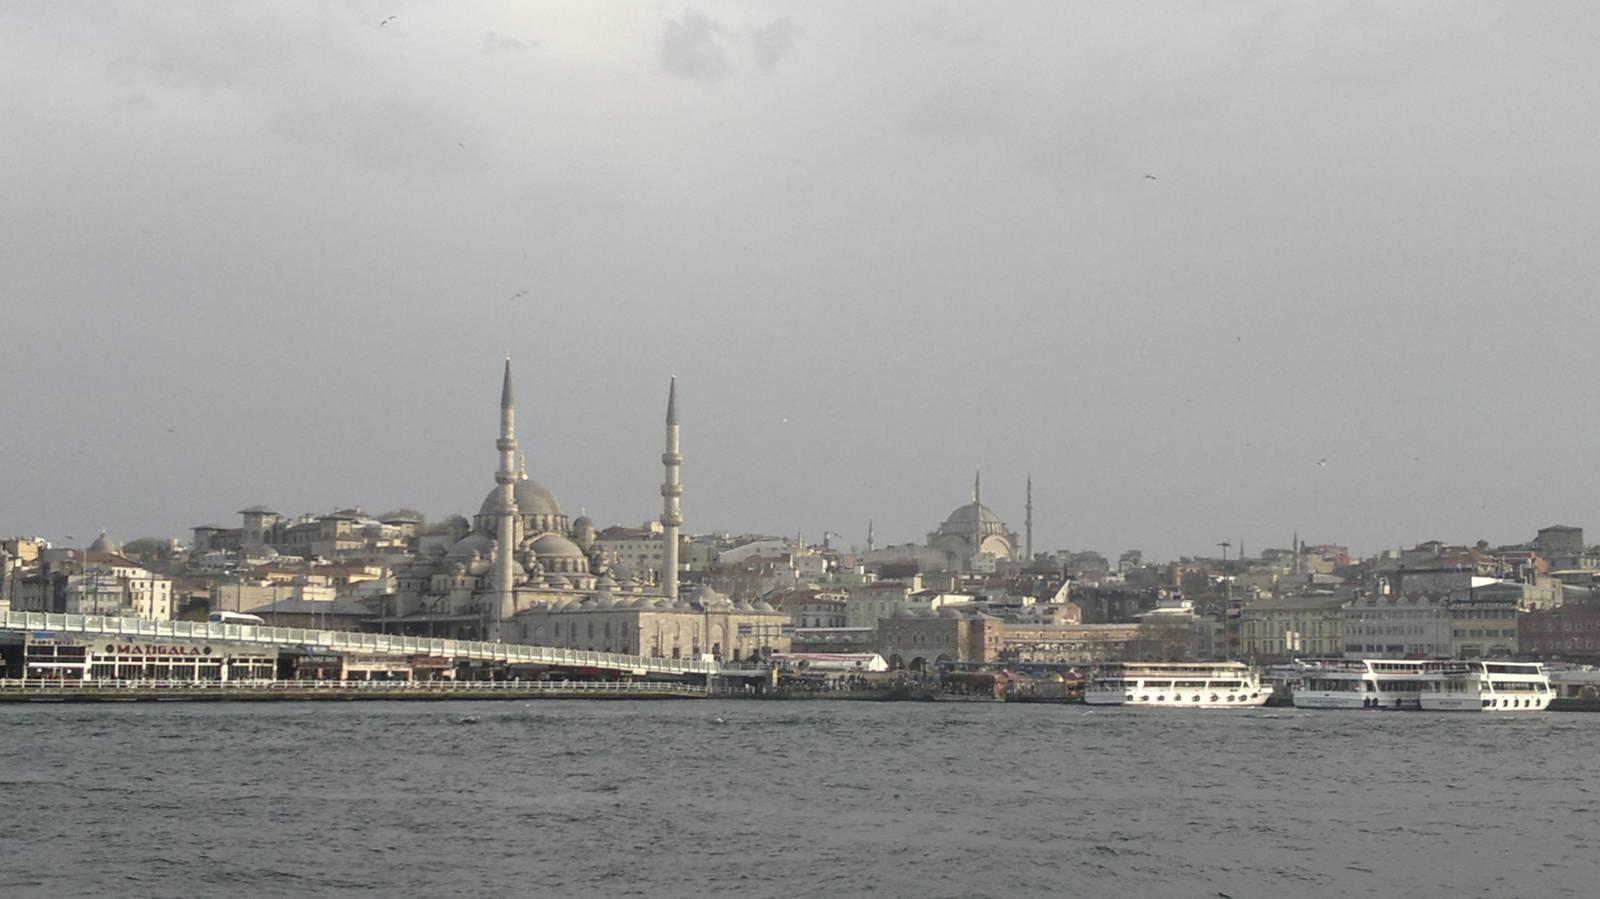 Istanbul-turchia-turkey-bosforo-chanel